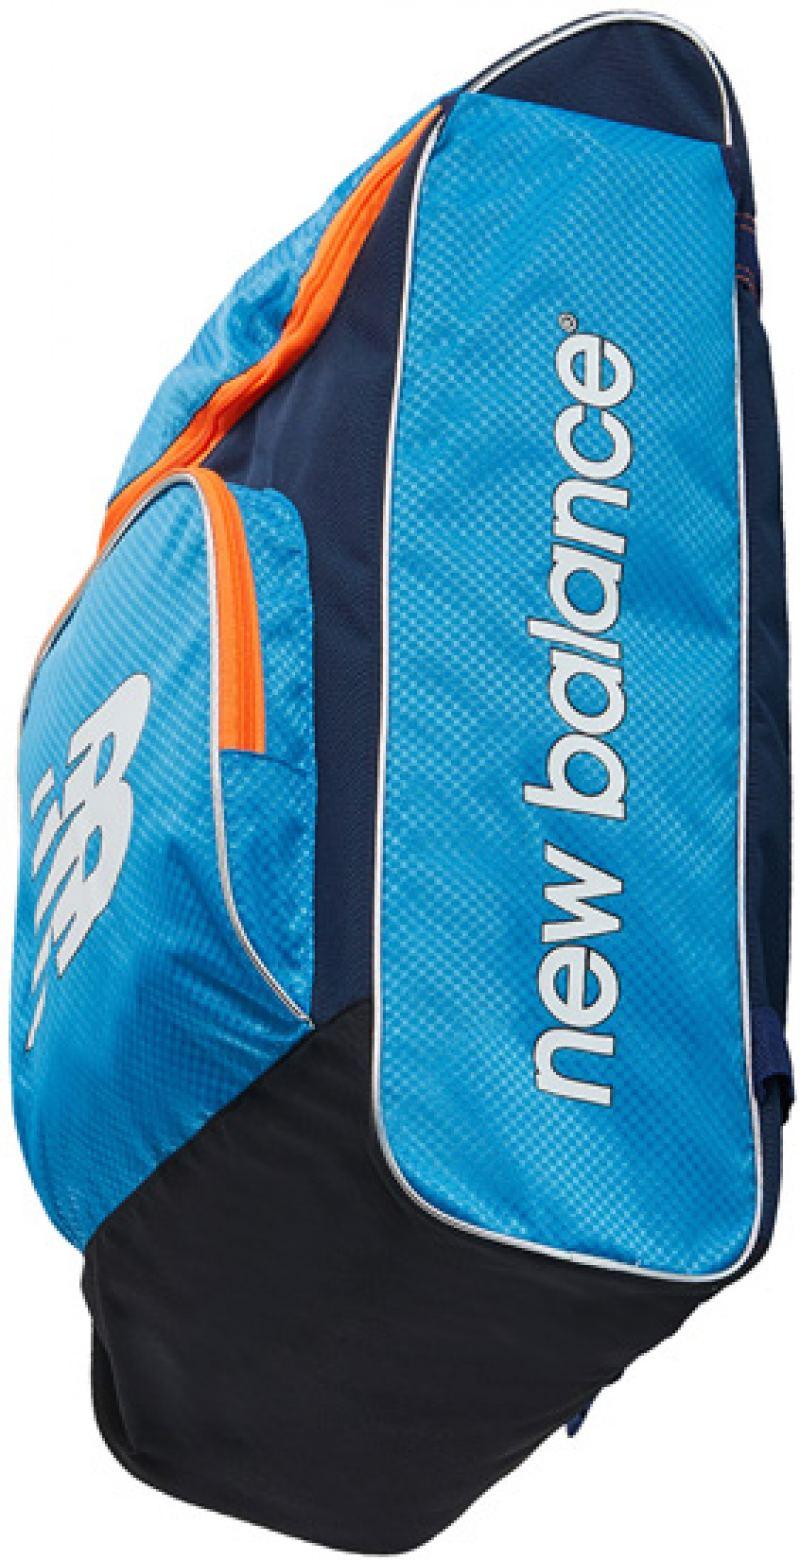 New Balance DC 580 Duffle Bag